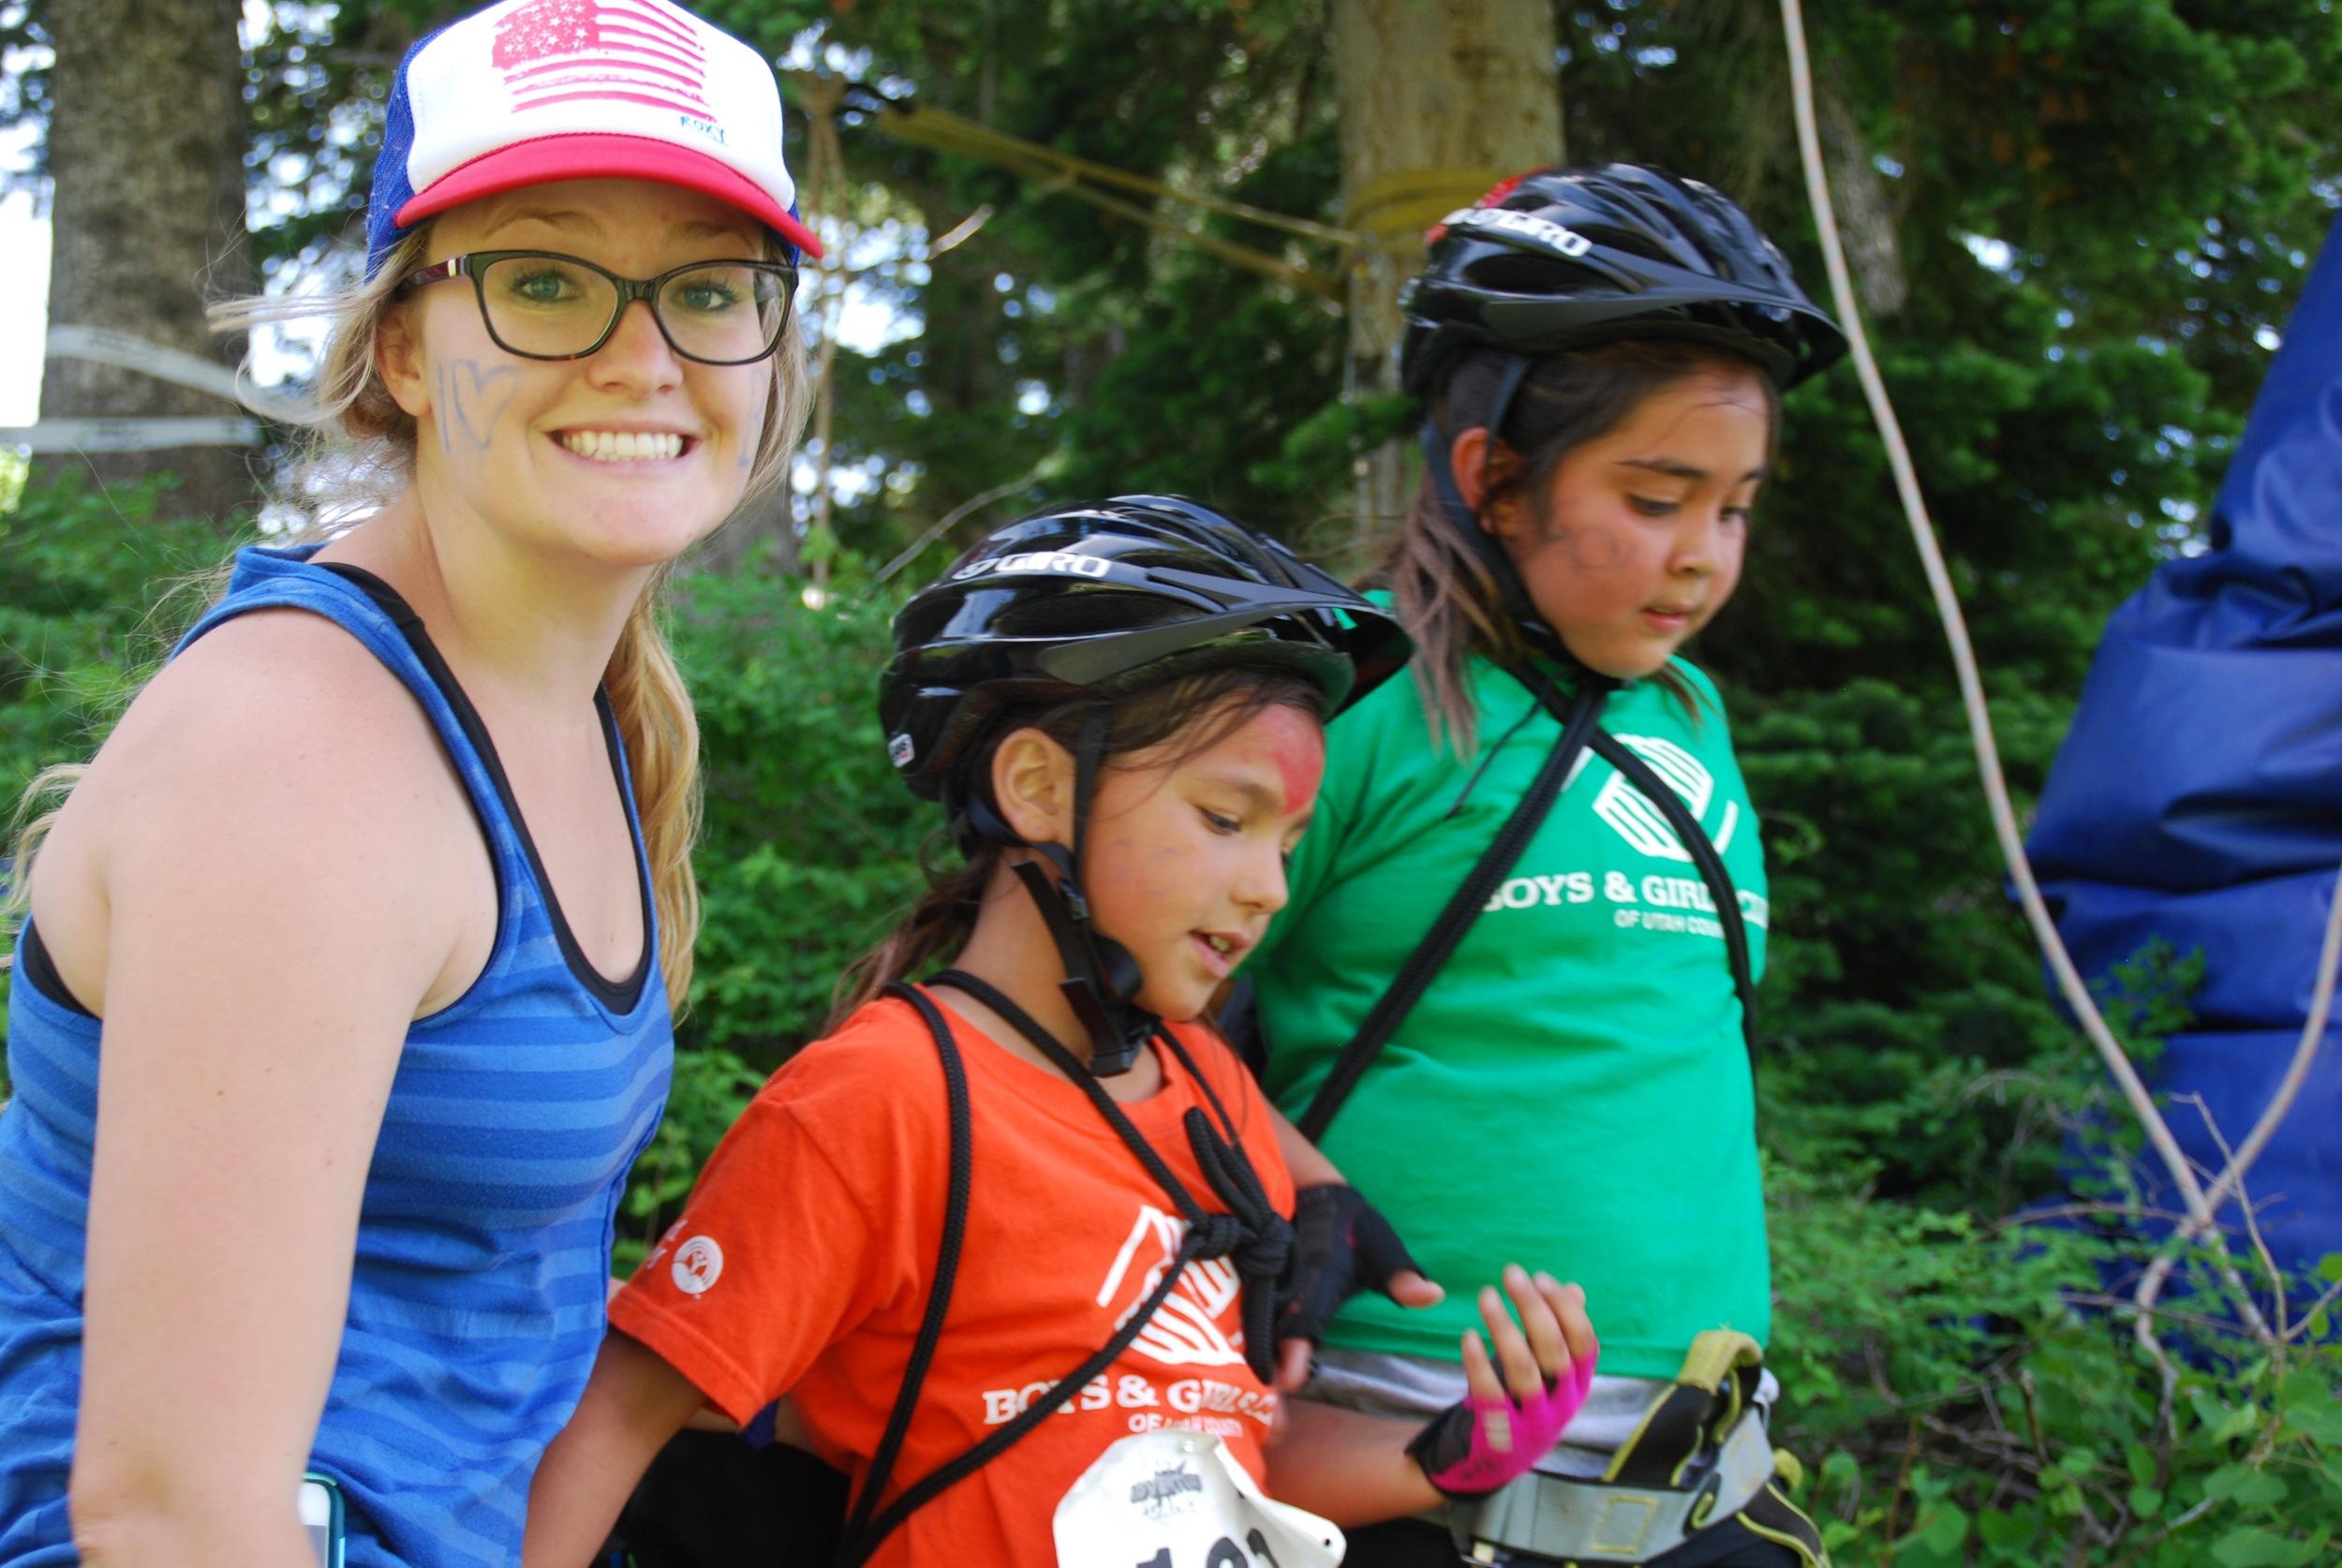 Fellow, Macie Bayer, helping two kids get onto the zipline